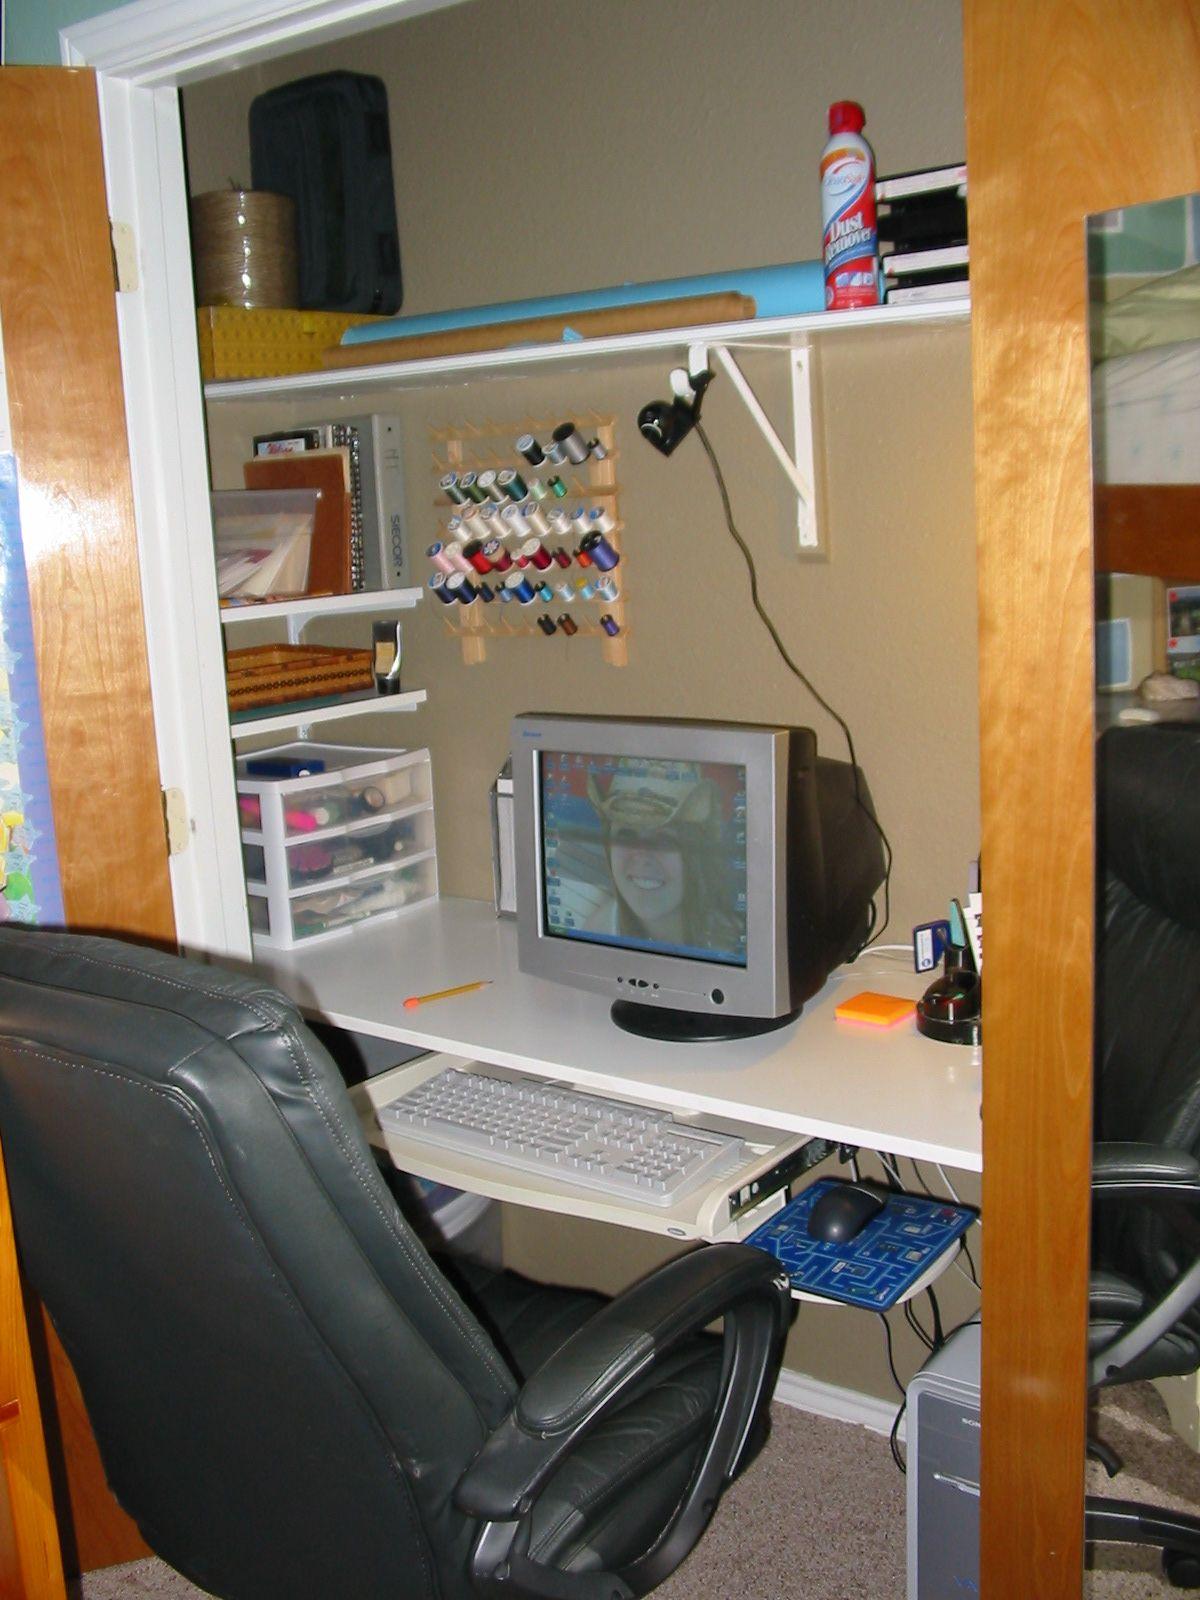 Convert closet to an office desk hung a slab of wood on